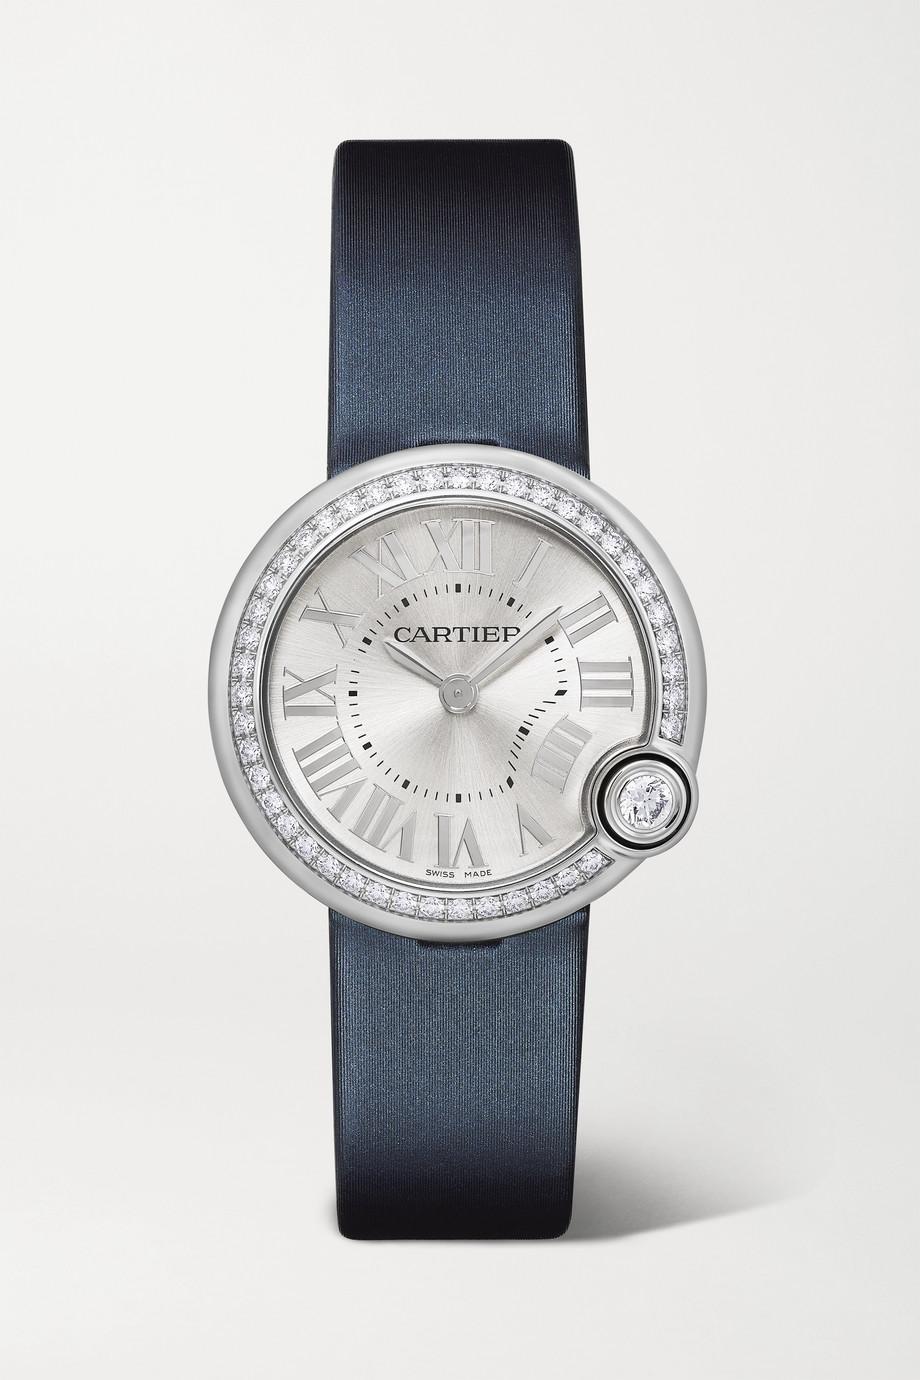 Cartier Ballon Blanc de Cartier 30 mm Uhr aus Edelstahl mit Lederarmband und Diamanten